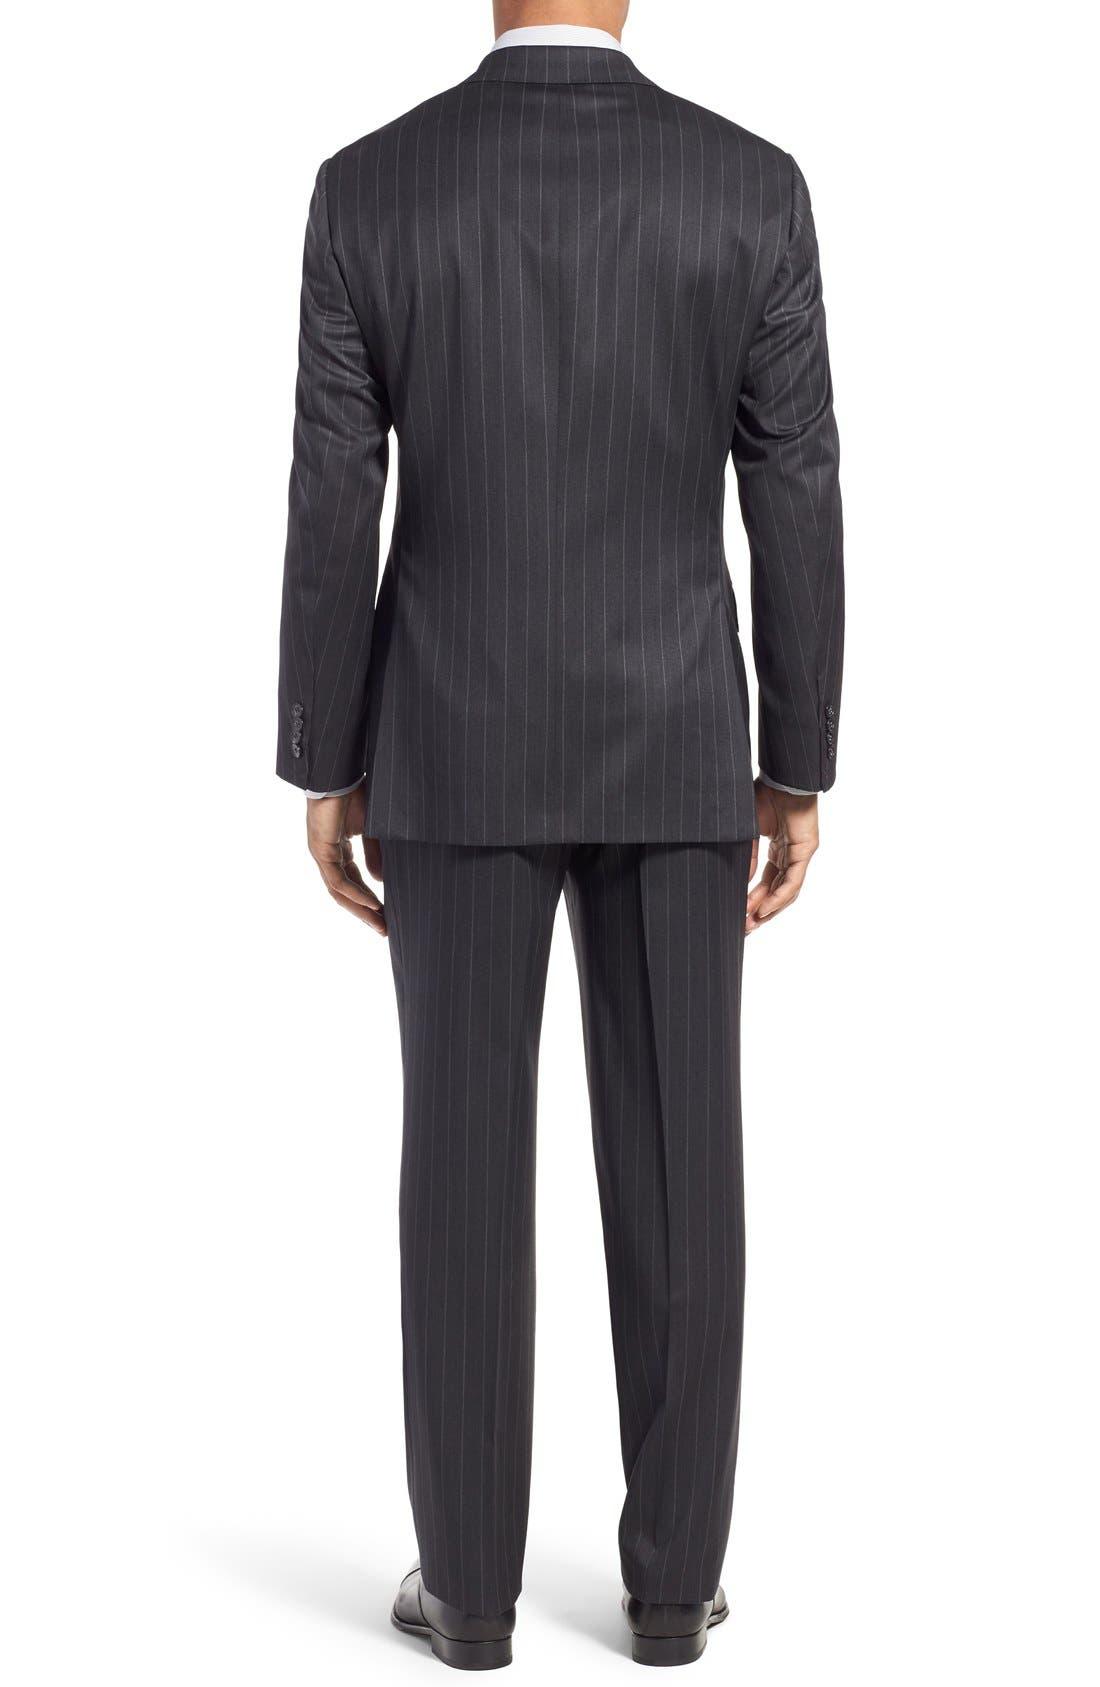 SAMUELSOHN, Classic Fit Stripe Wool Suit, Alternate thumbnail 2, color, 025